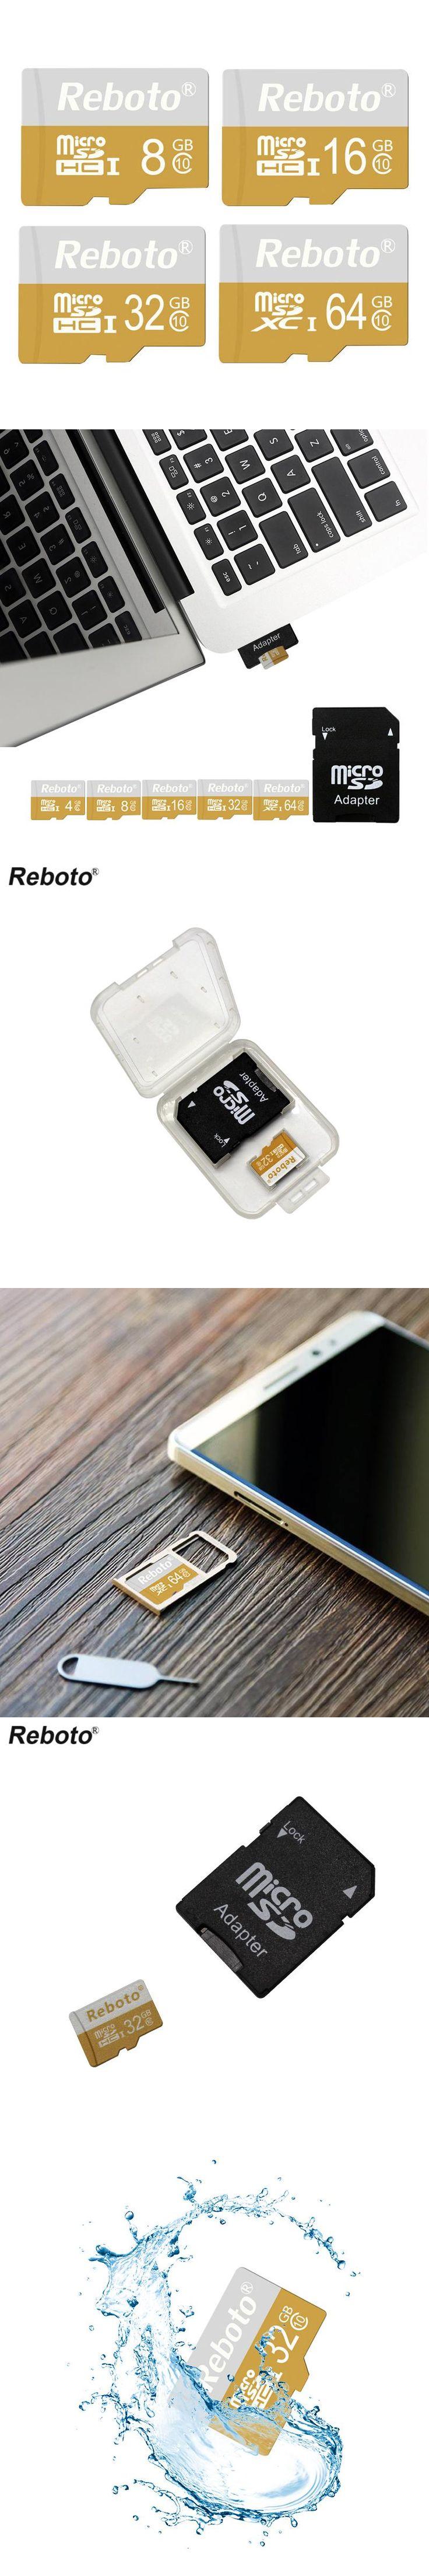 High Speed Micro SD Card Memory Card 64GB 32GB 16GB 8GB 4GB Mini Gifts Class10 TF Card for Smartphone Hot Selling